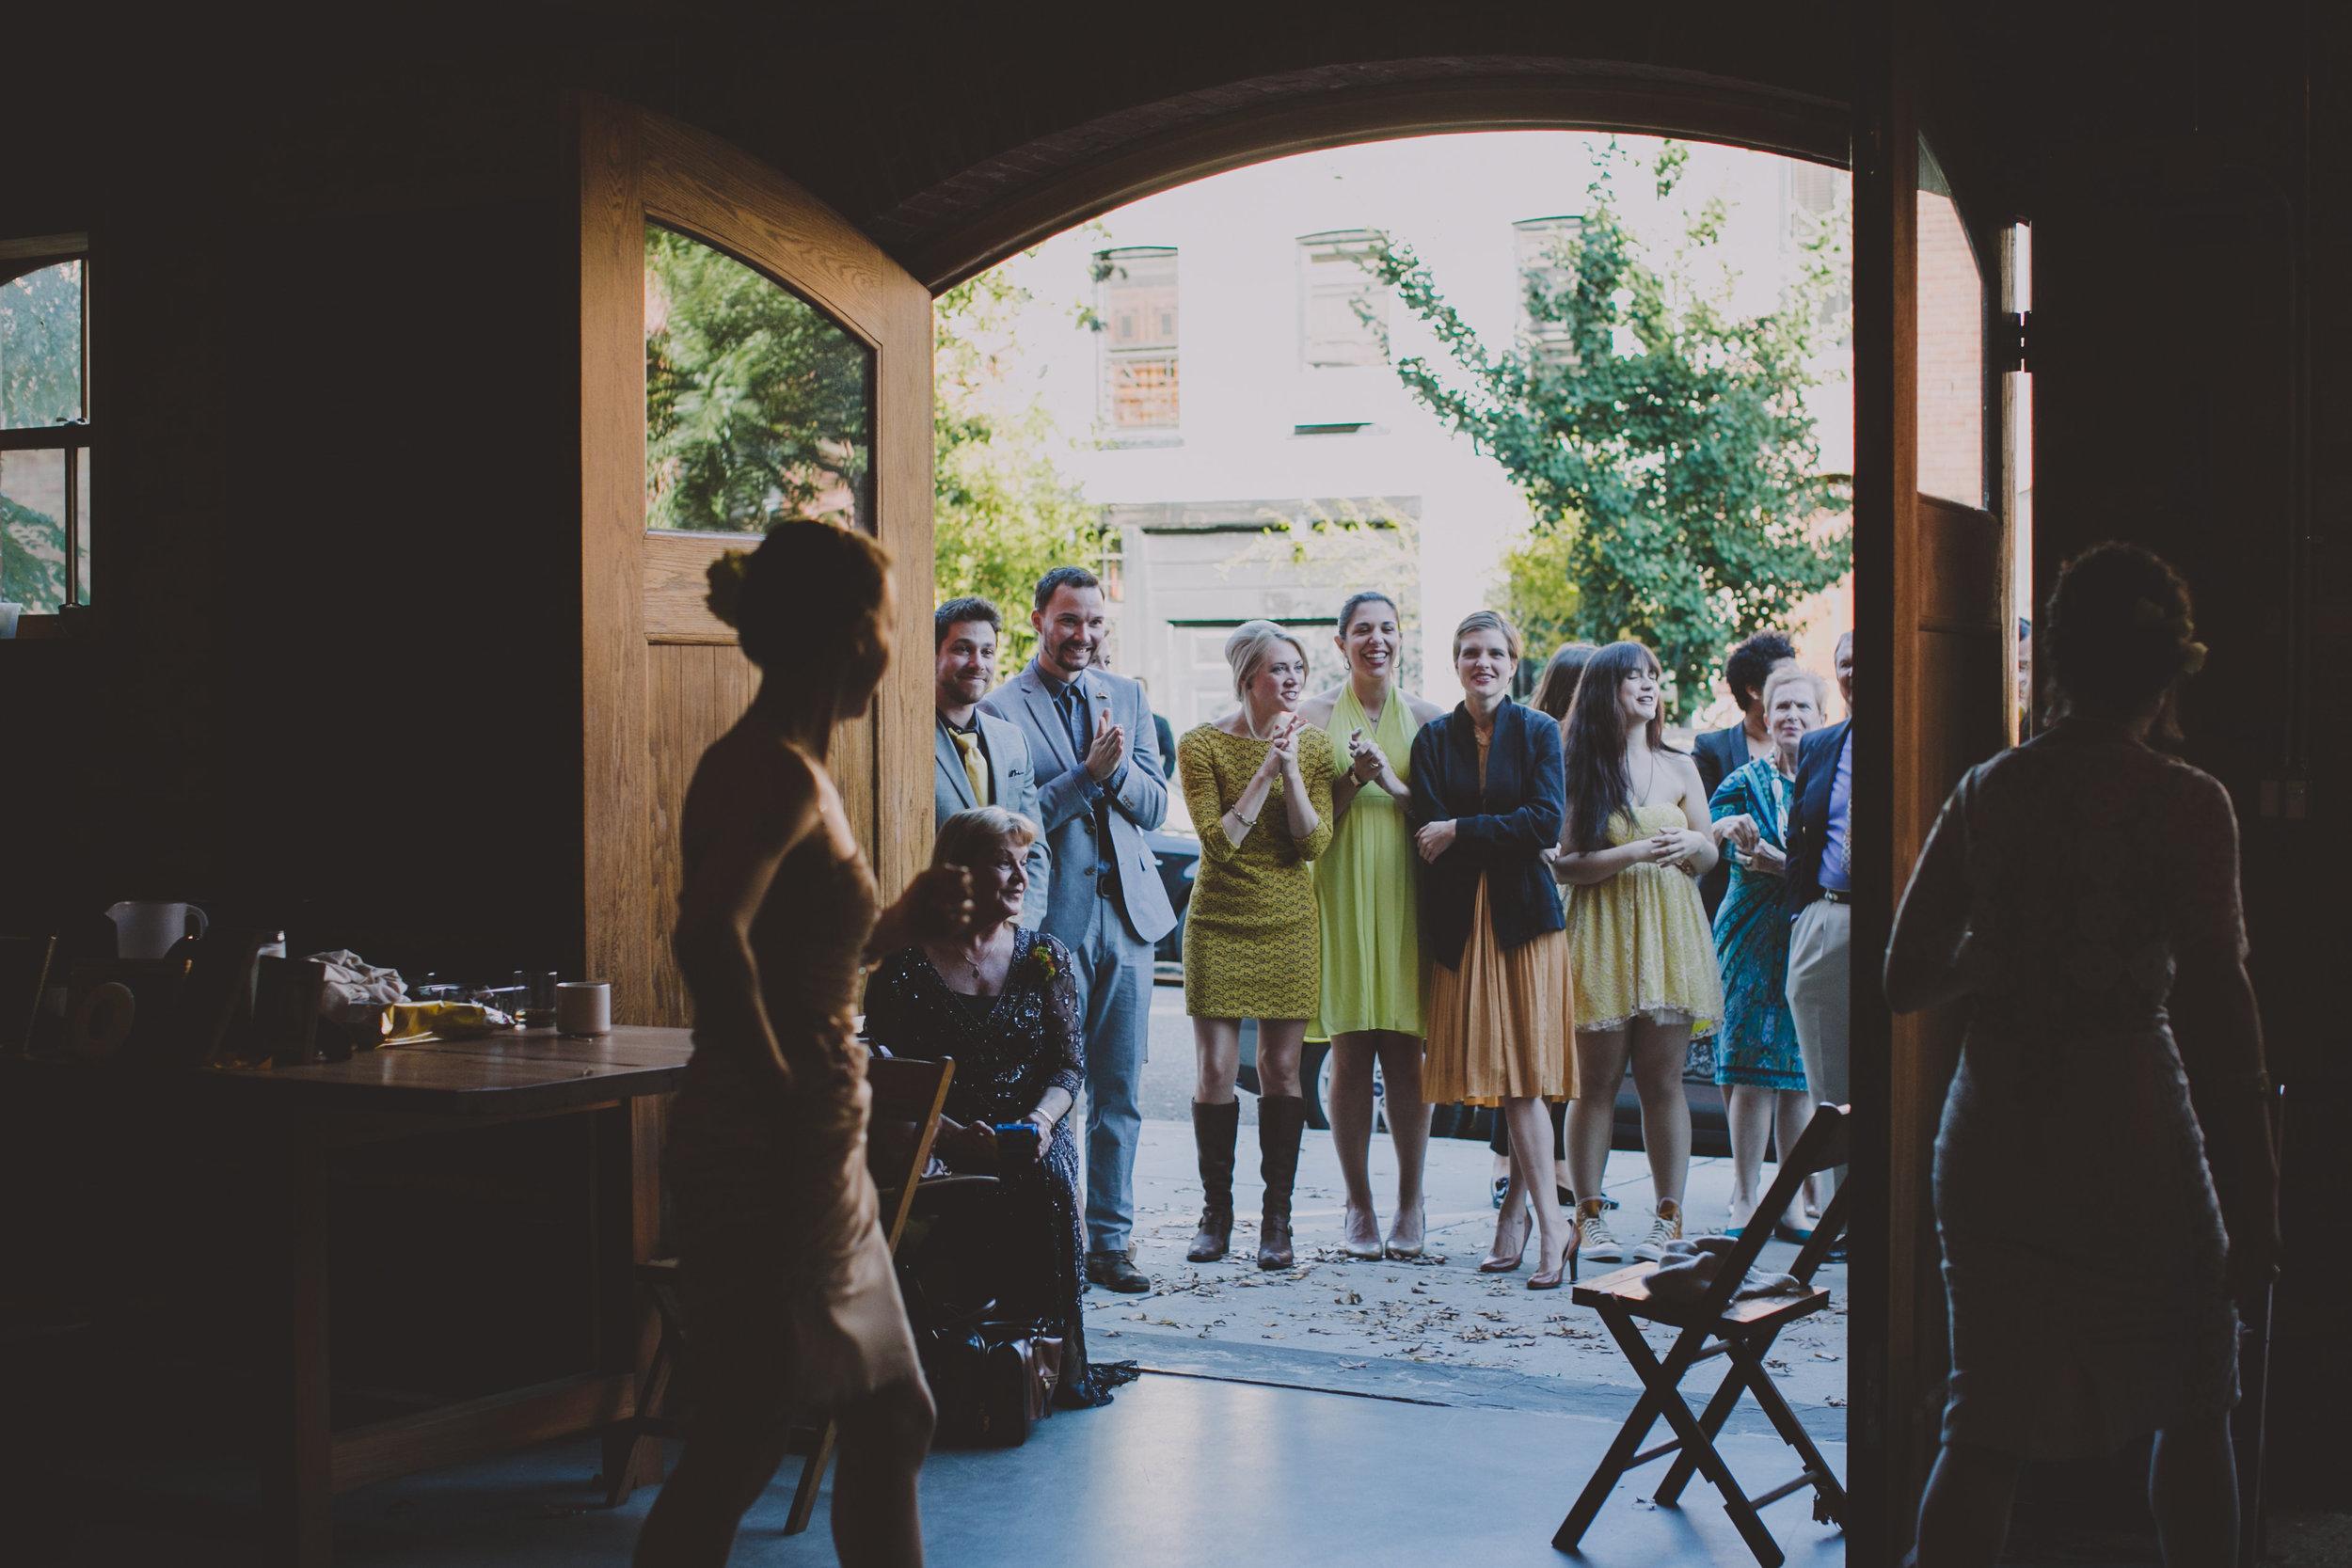 THE GREEN BUILDING LESBIAN GAY WEDDING CHELLISE MIKE BROOKLYN PHOTOGRAPHER